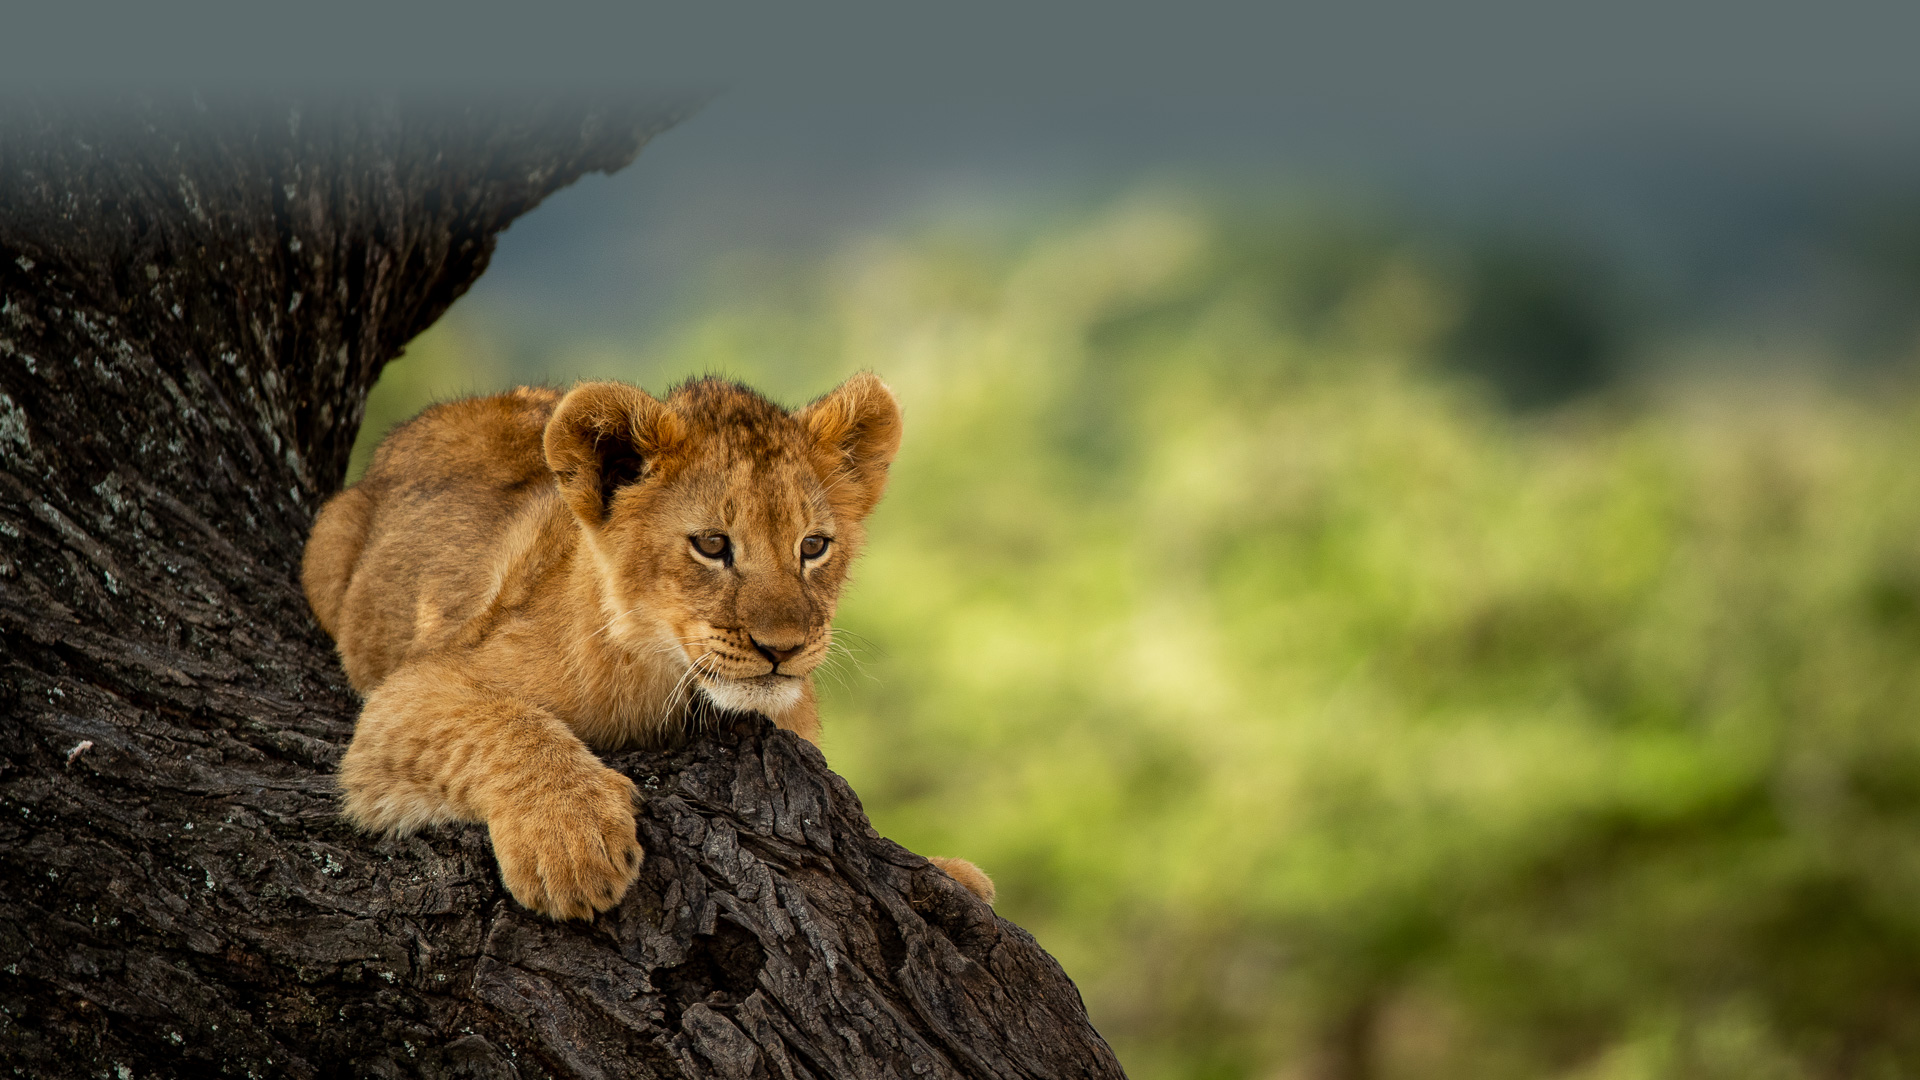 Simba in the tree